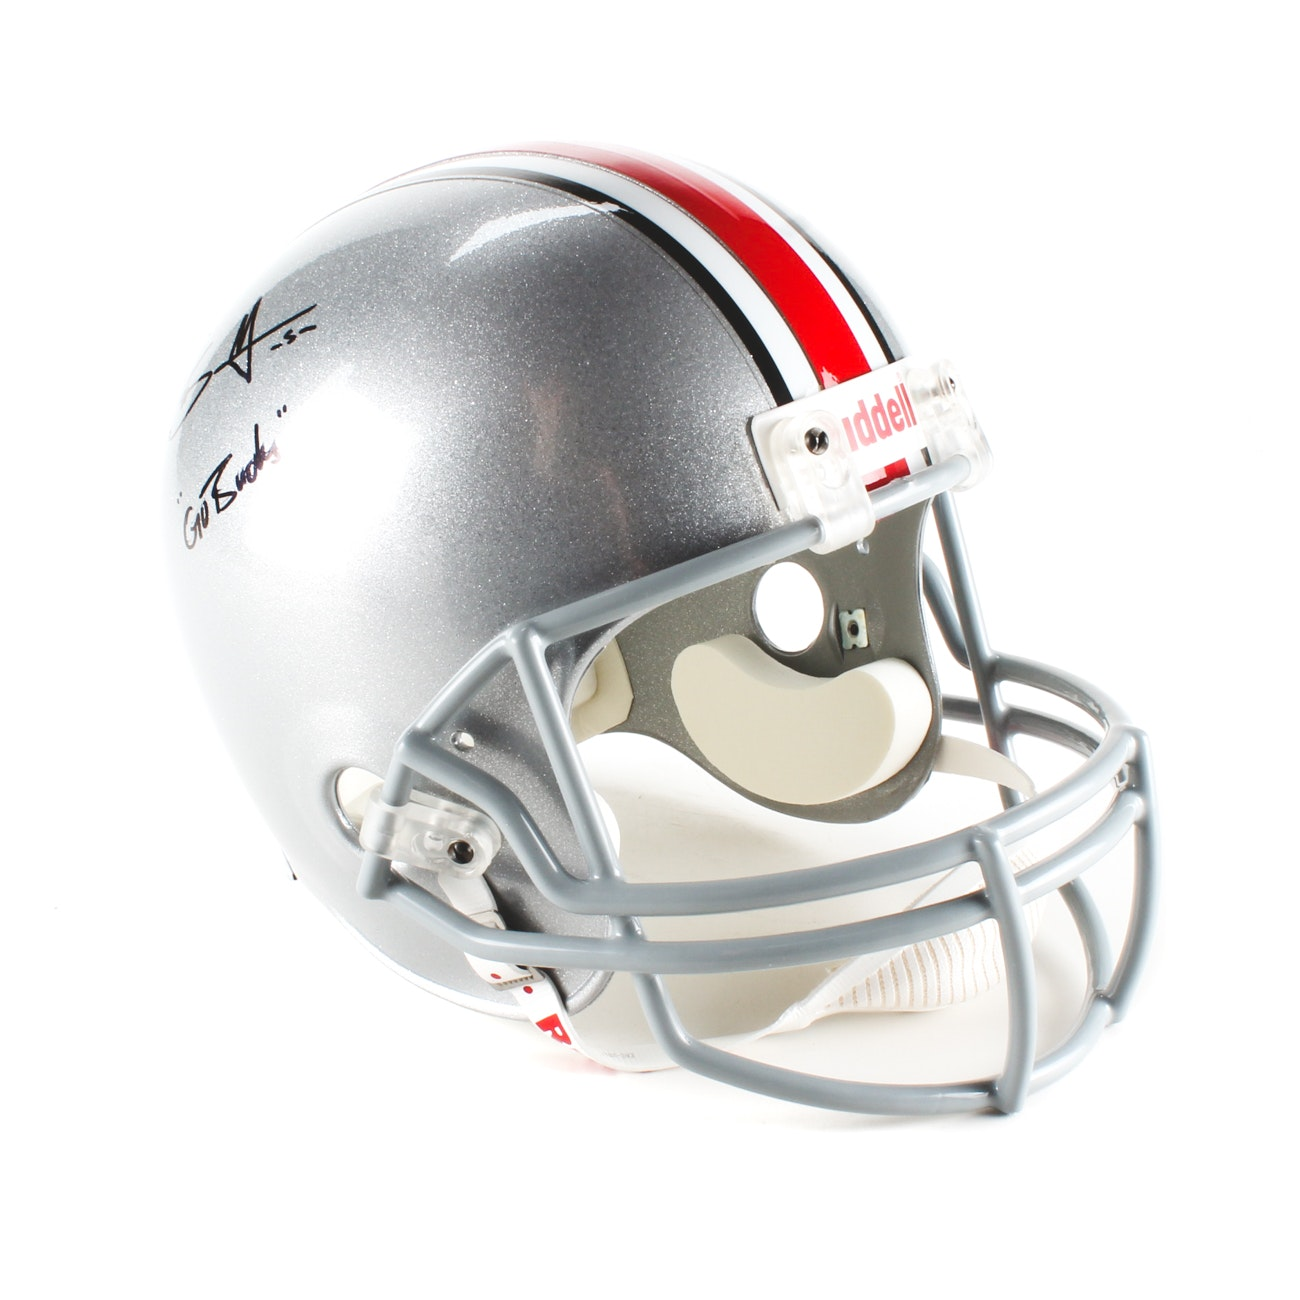 Braxton Miller Signed Helmet  COA